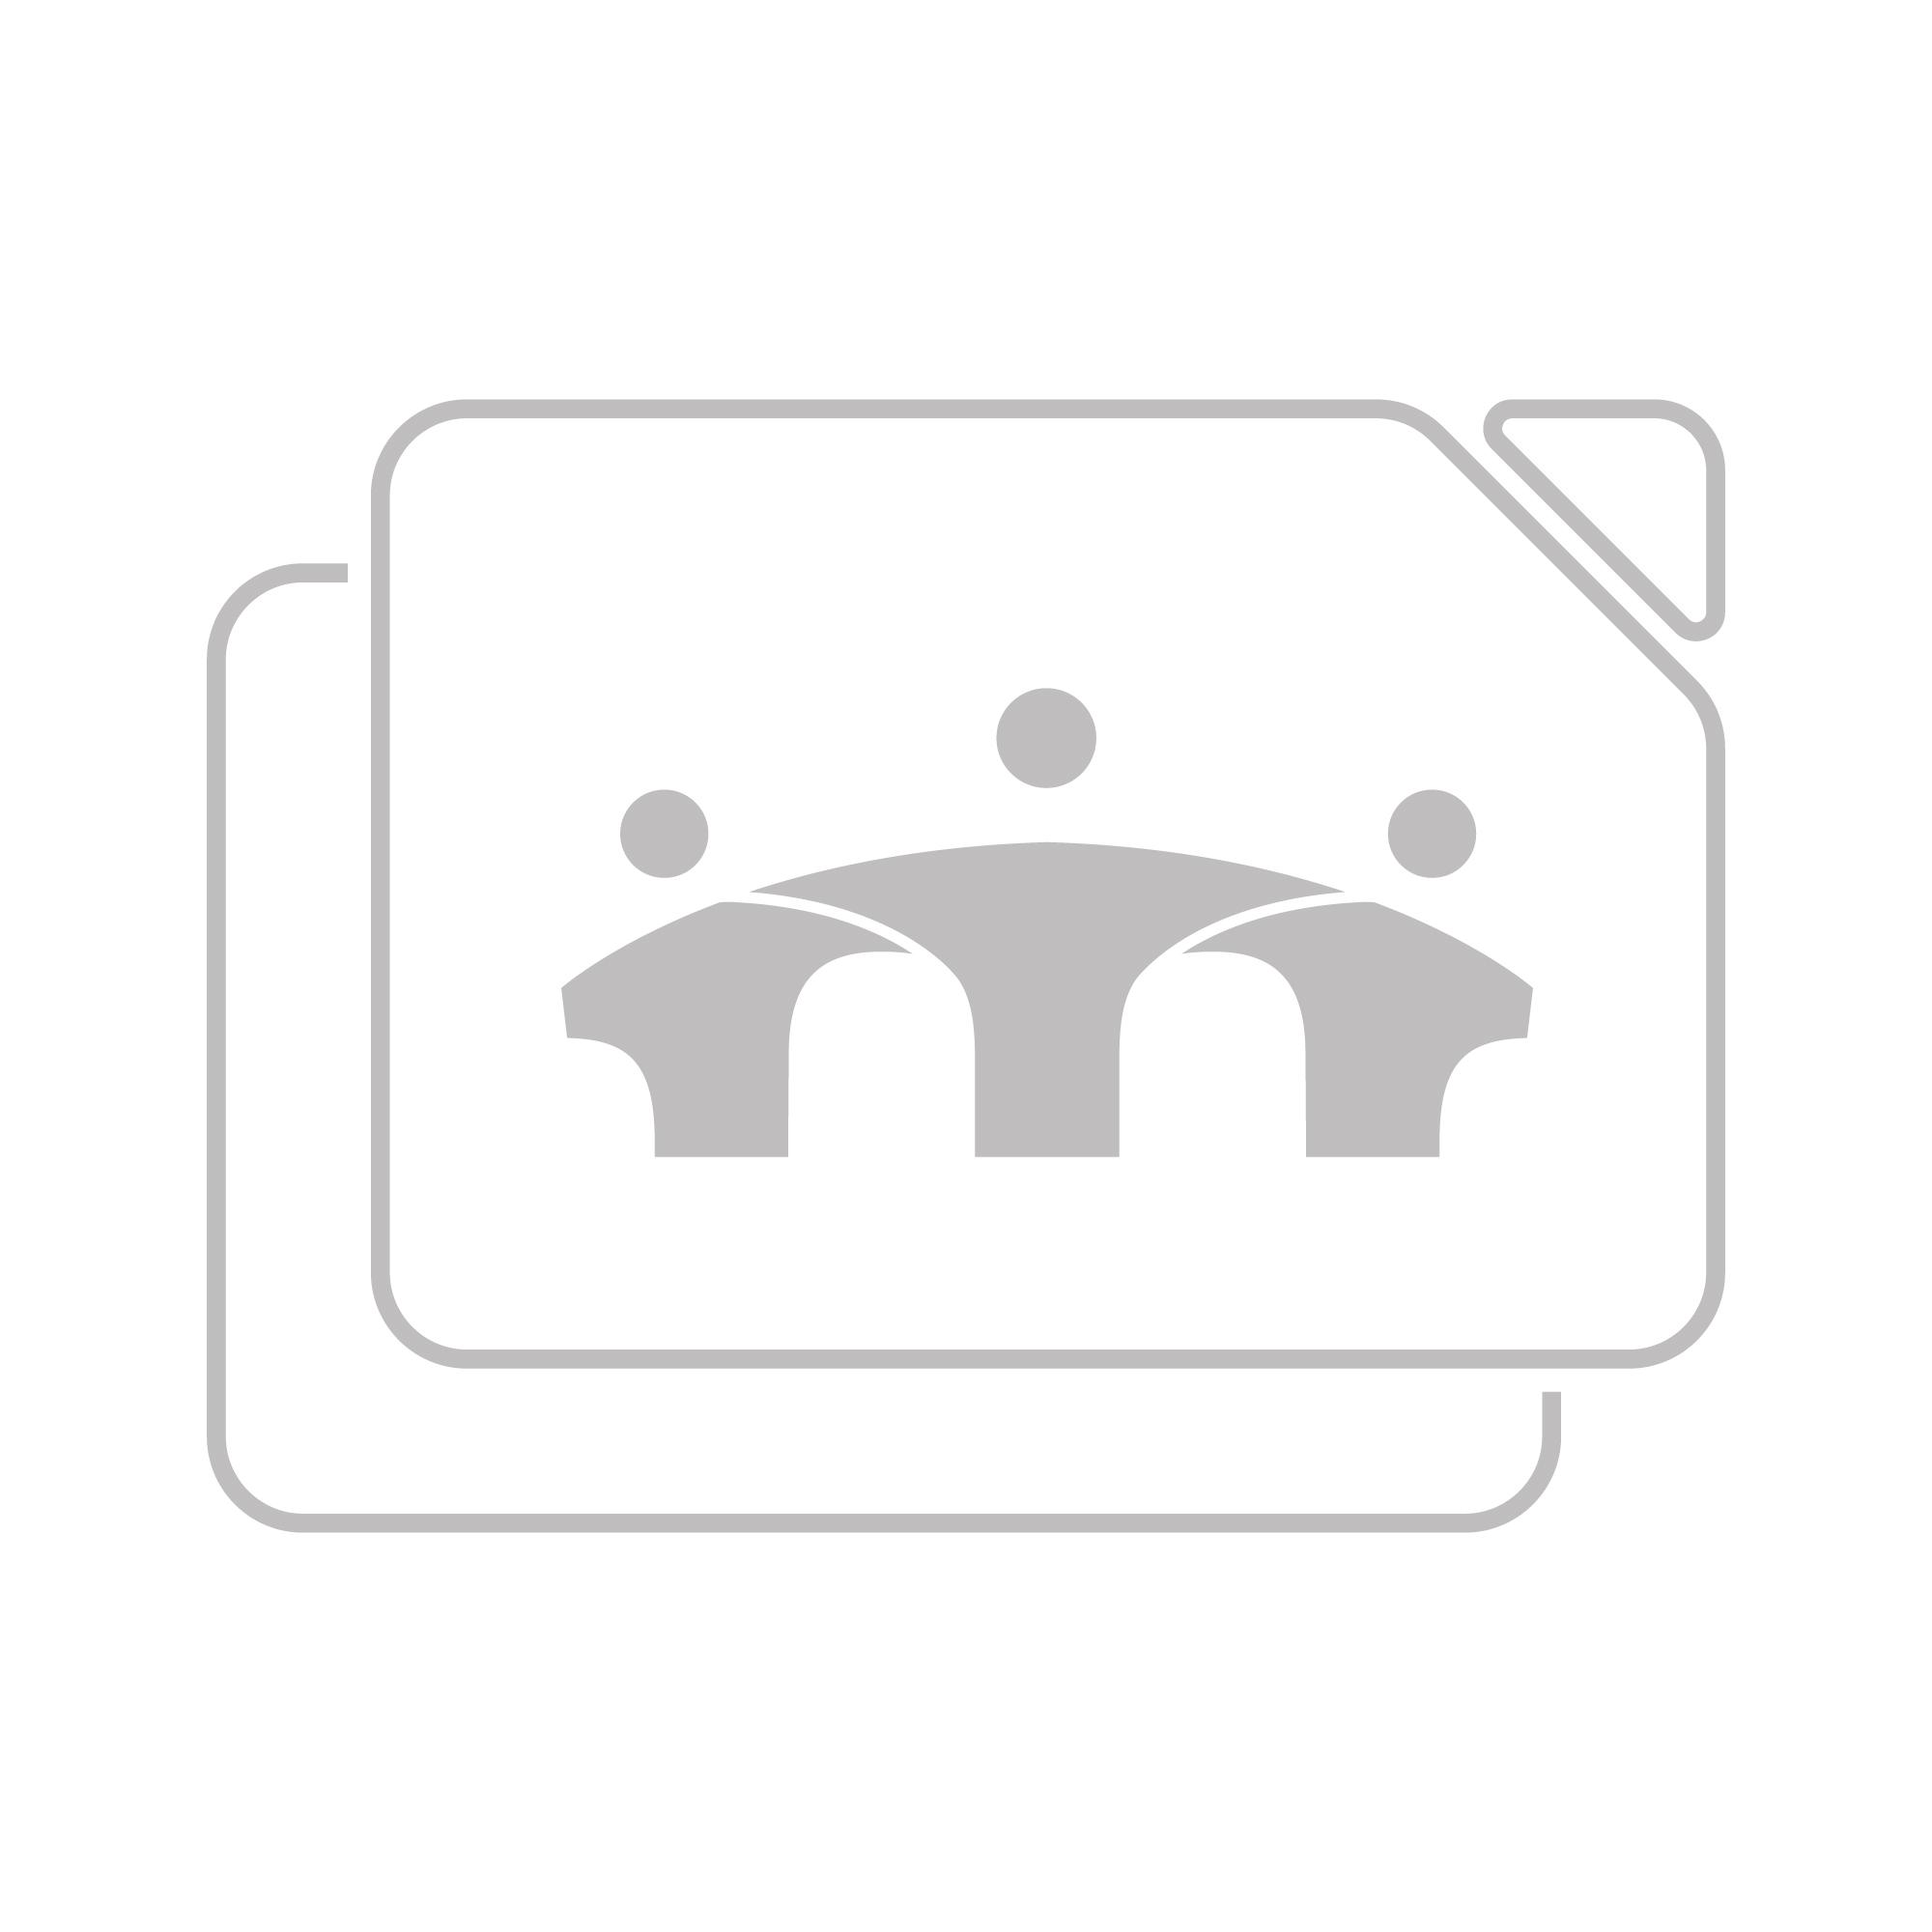 Mersive Solstice Pod Gen3 Unlimited Enterprise with 5 year Solstice Subscription